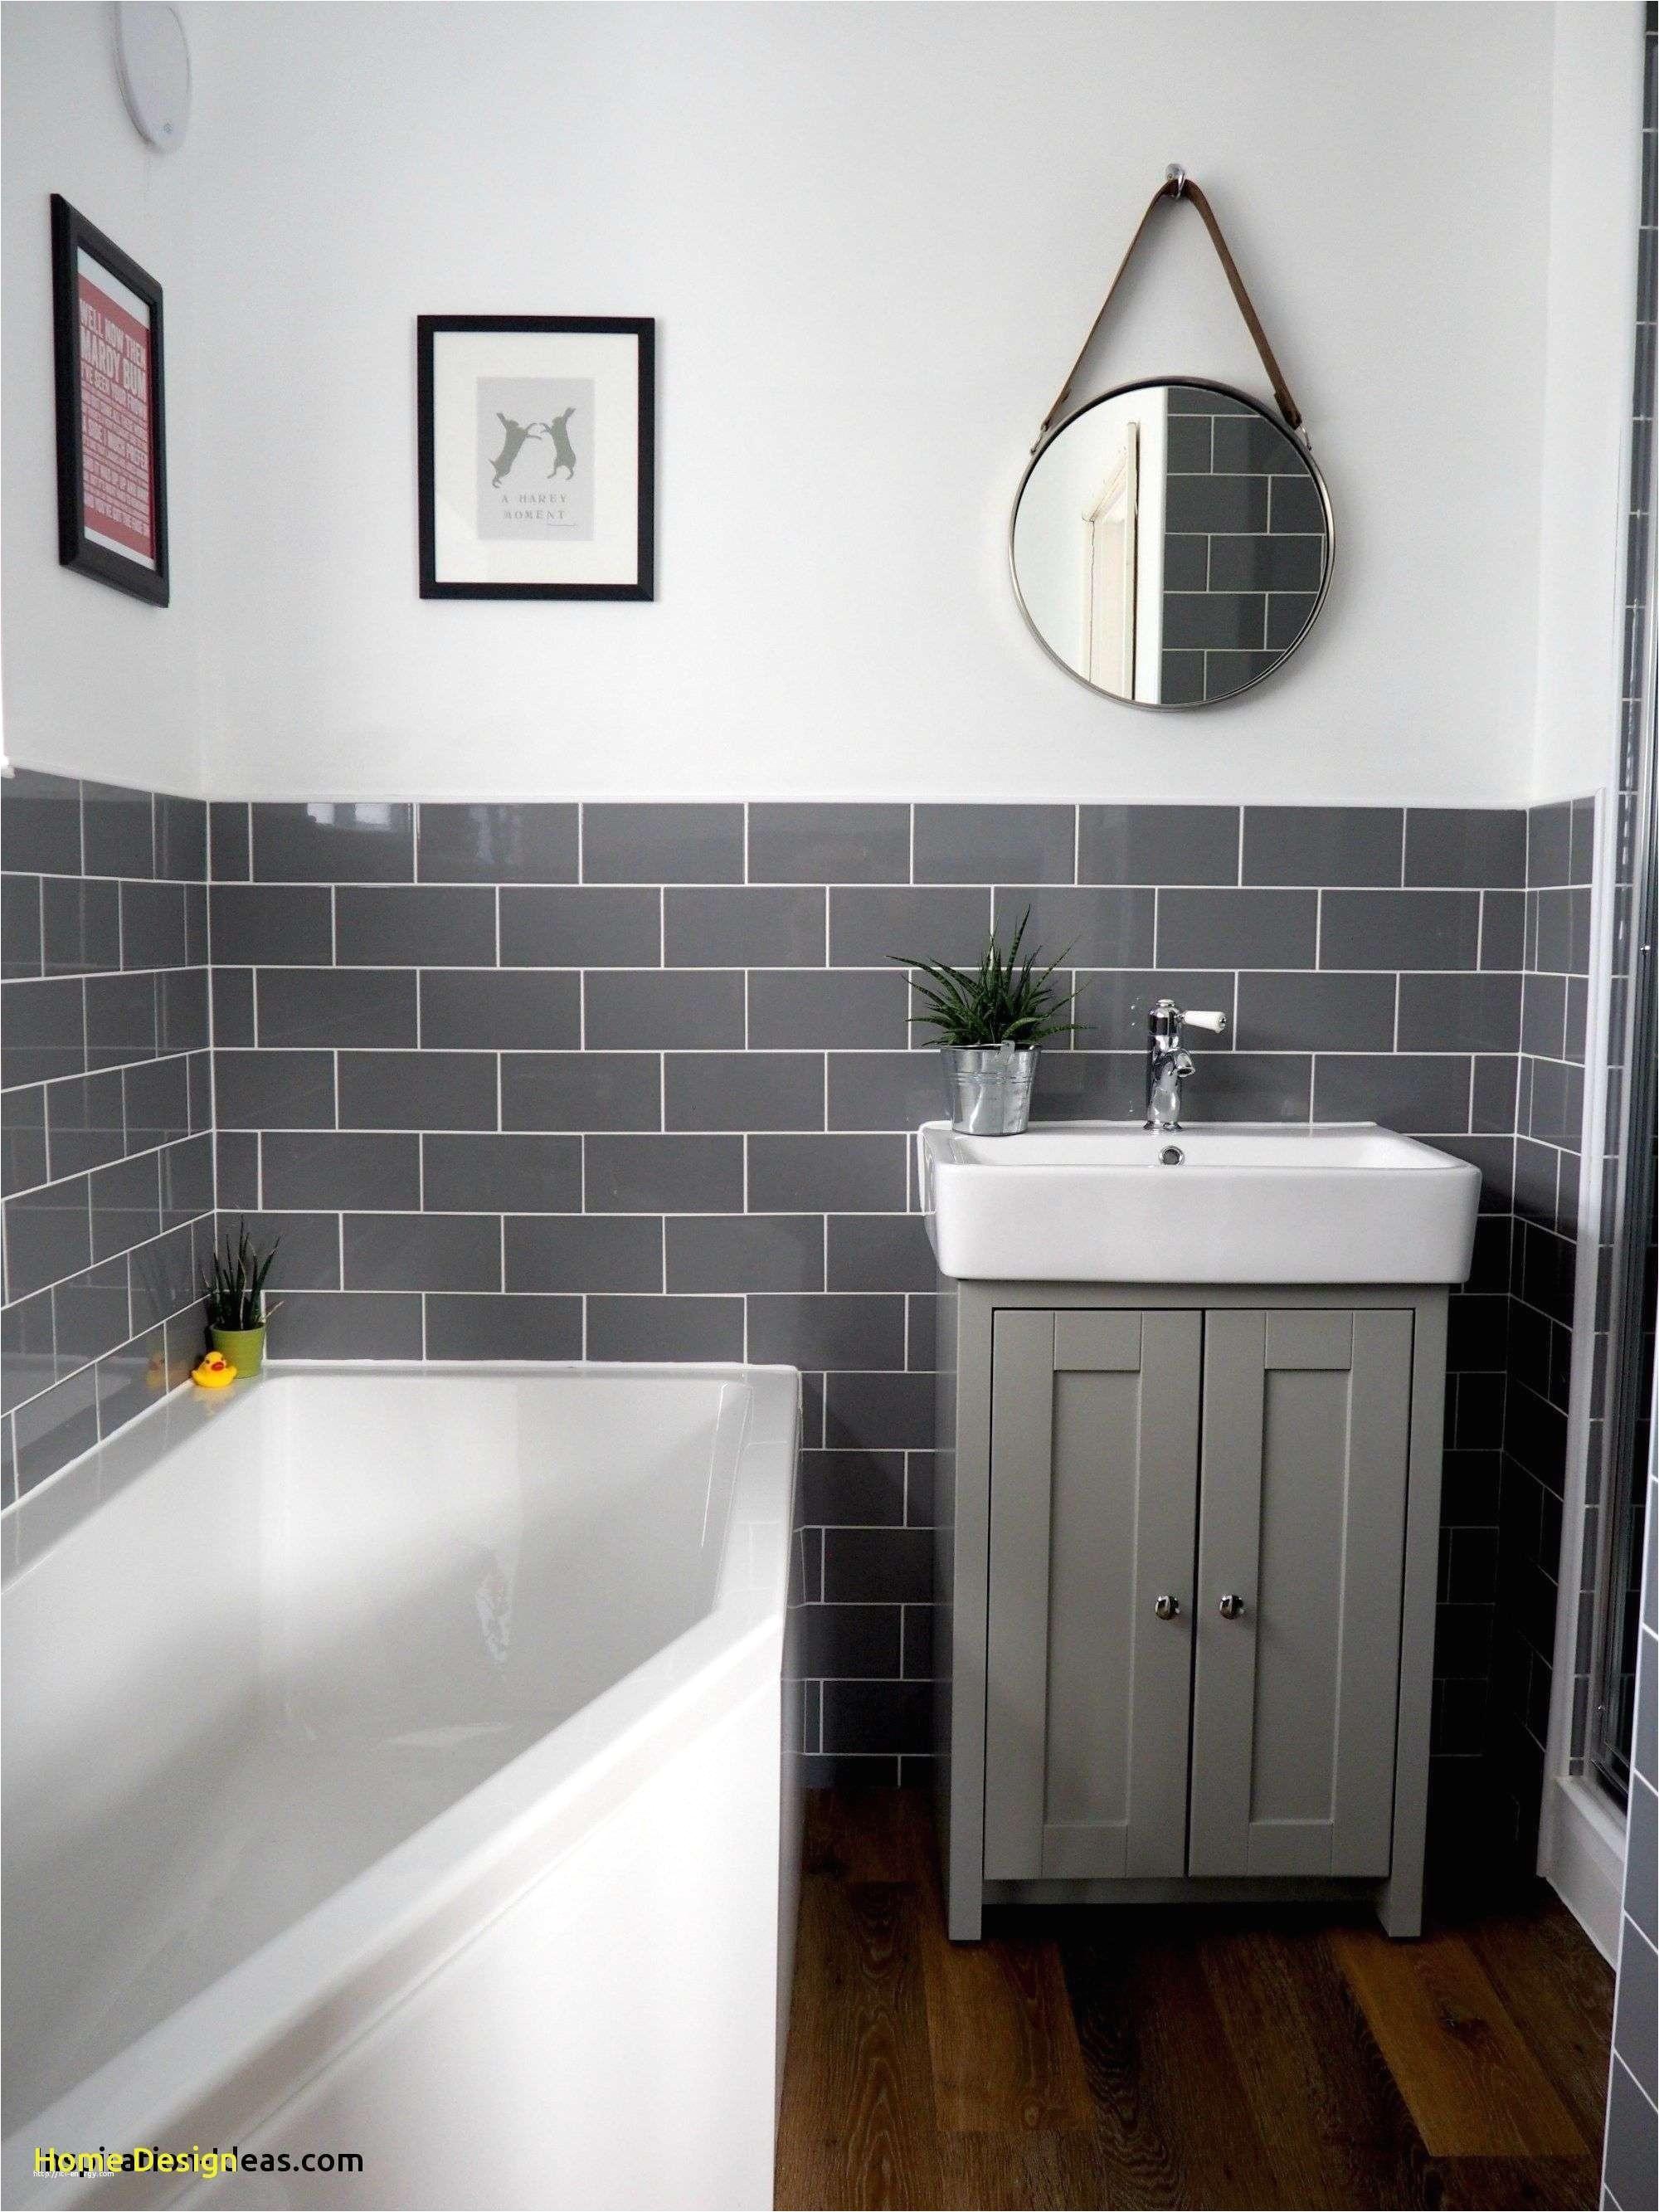 Home Tile Design Ideas New Bathroom Designs Bathroom Tile Designs For Small Bathrooms Tile